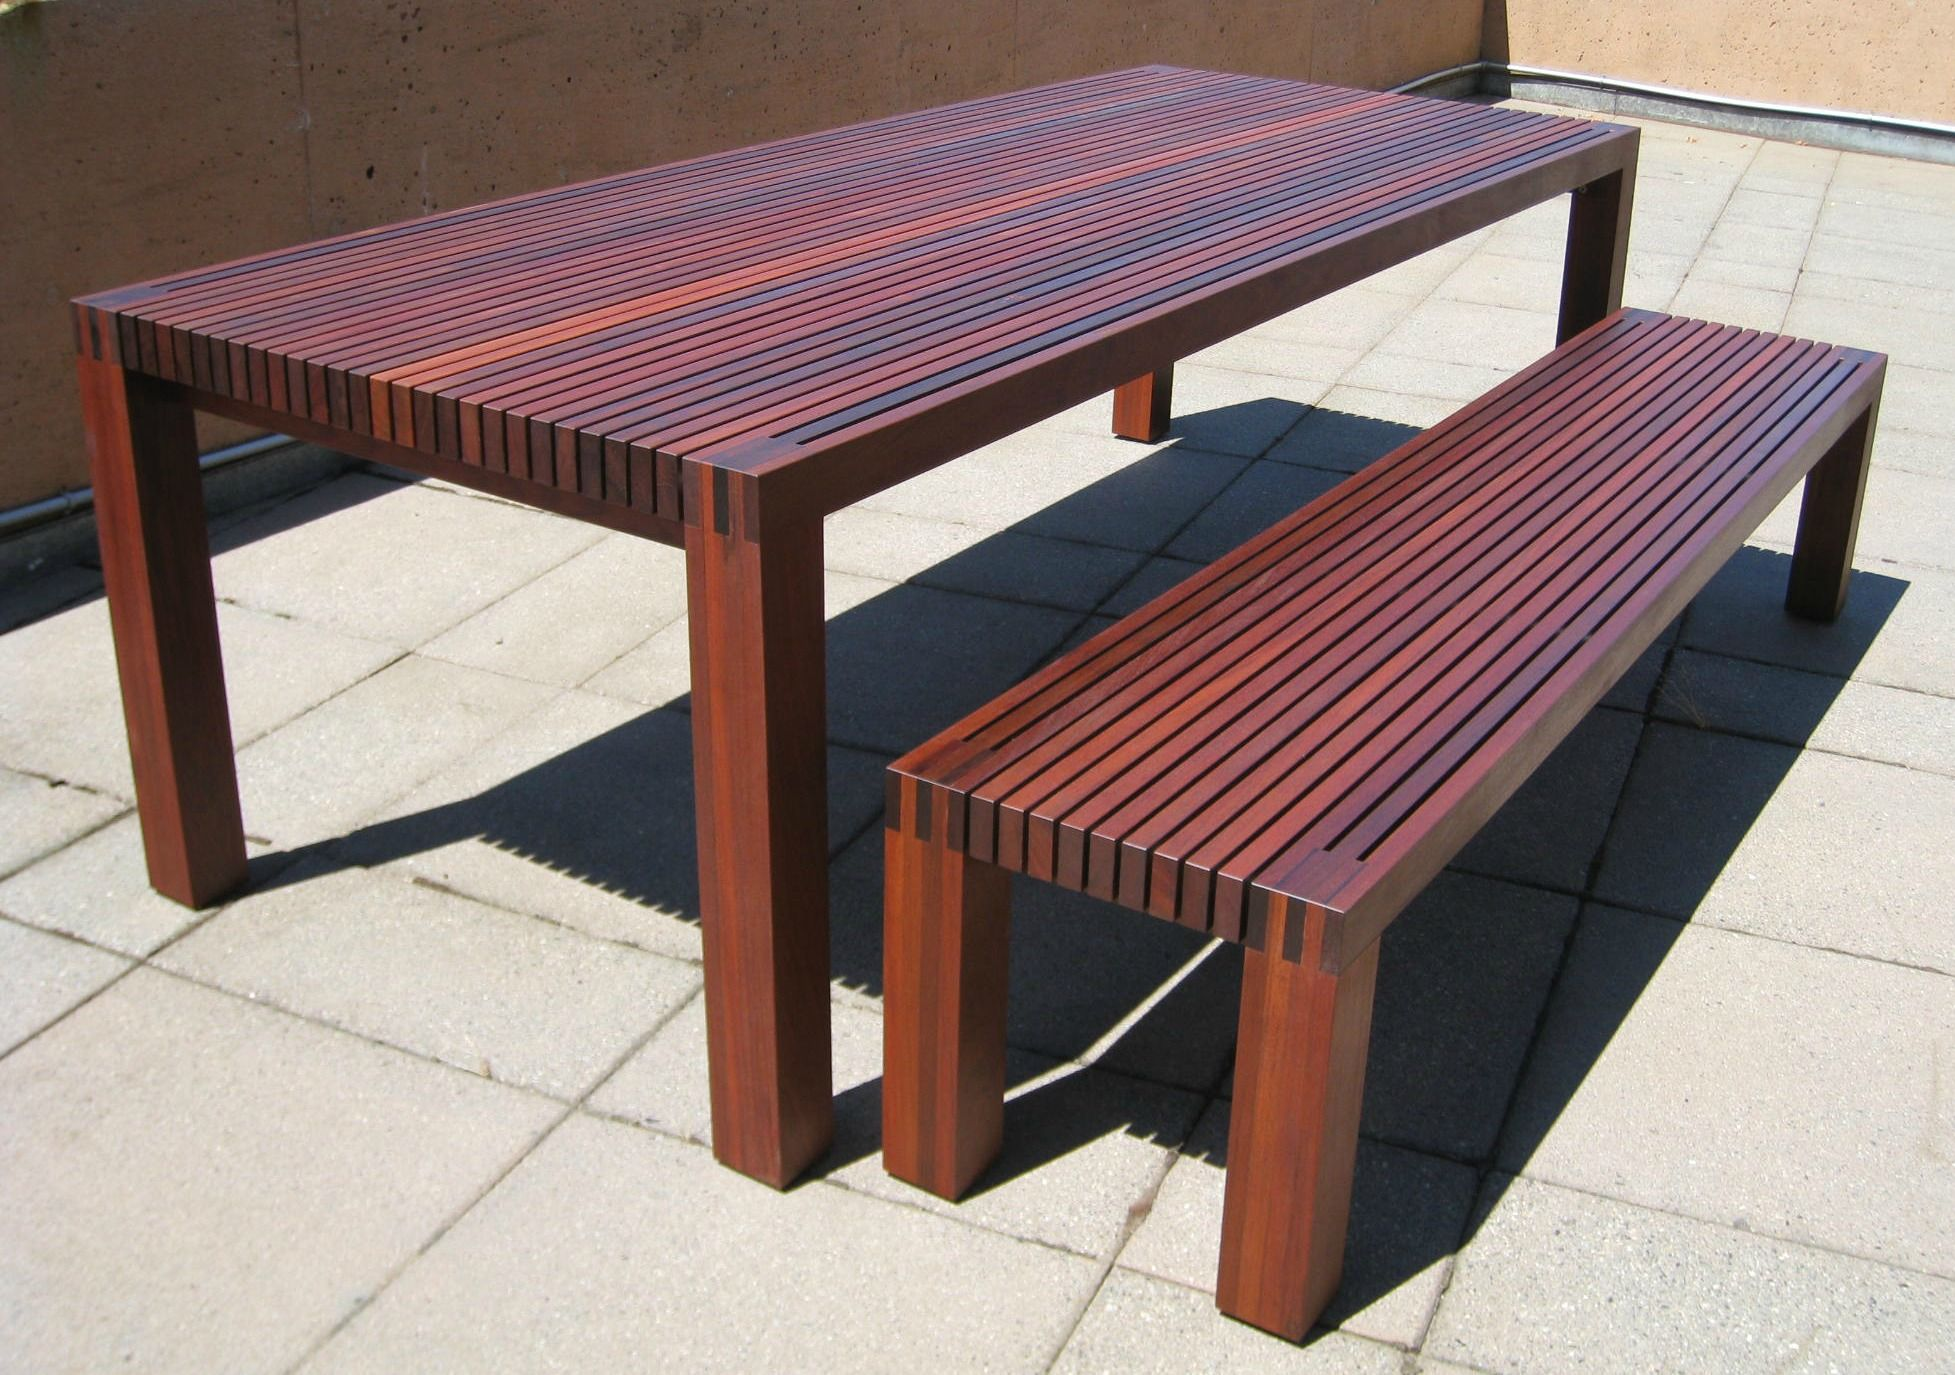 6 slatted outdoor table bench ipe wood table diy diy